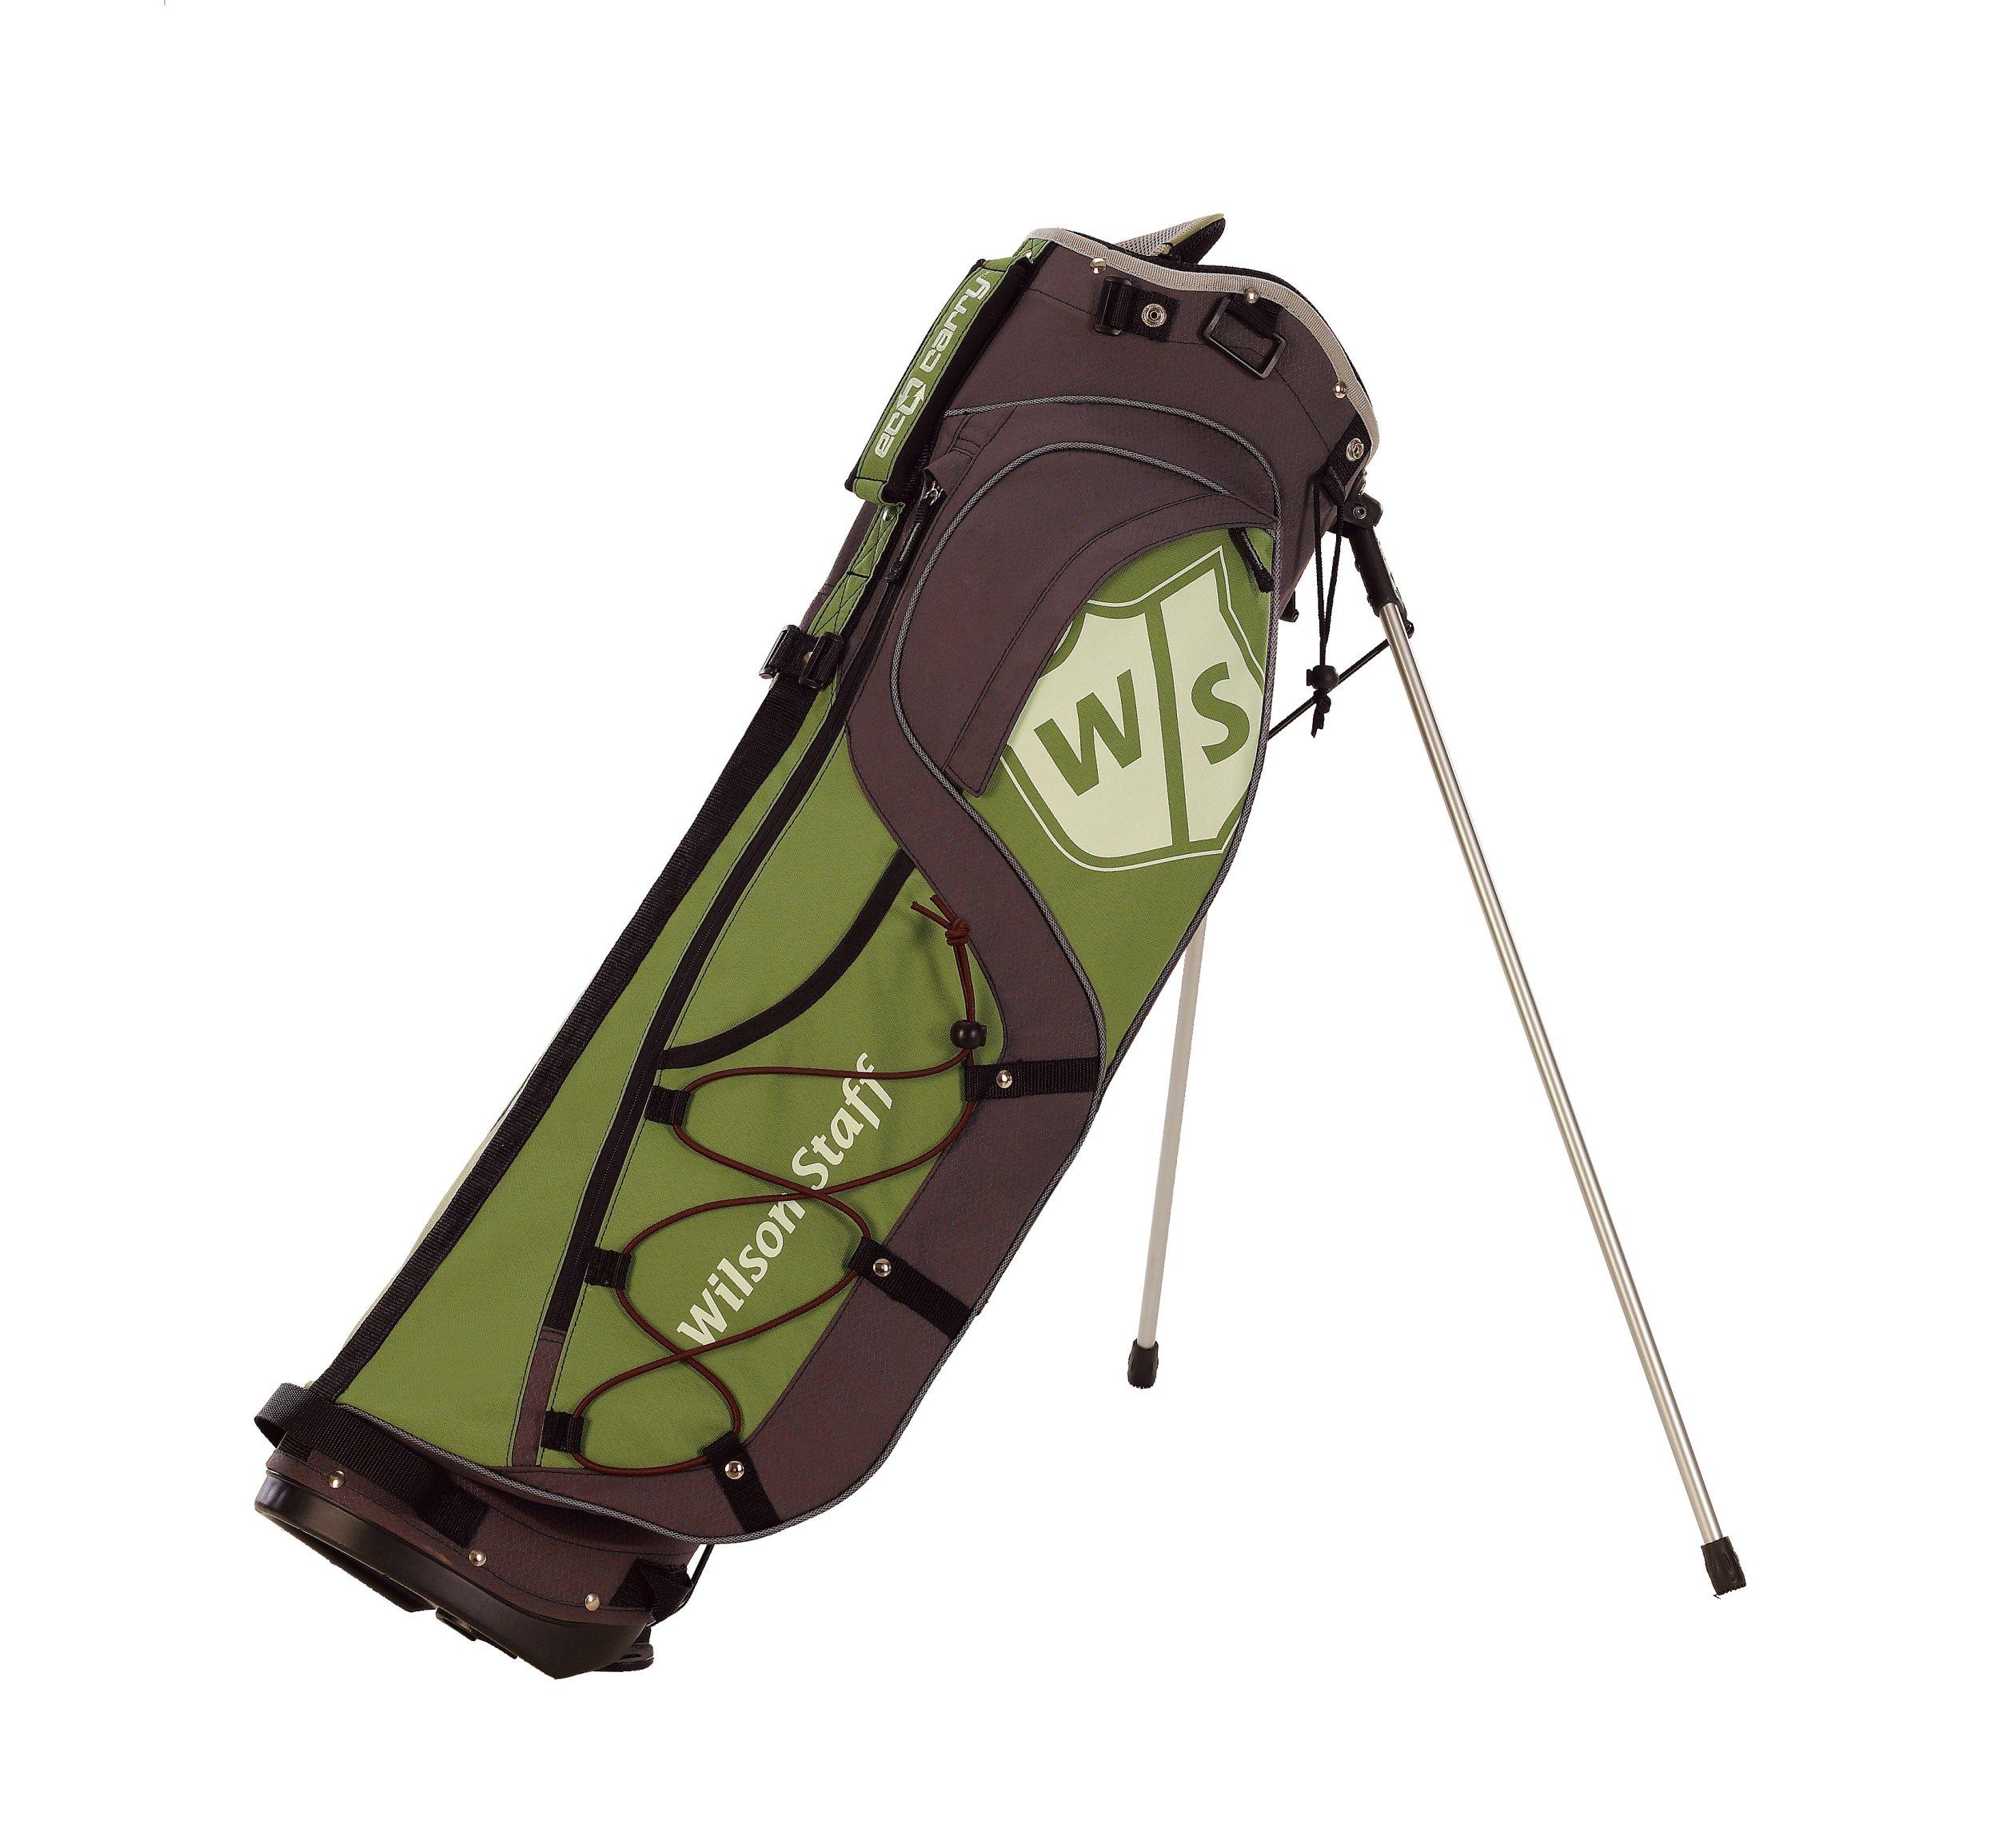 Wilson Staff Eco Carry Golf Bag (Moss Green)